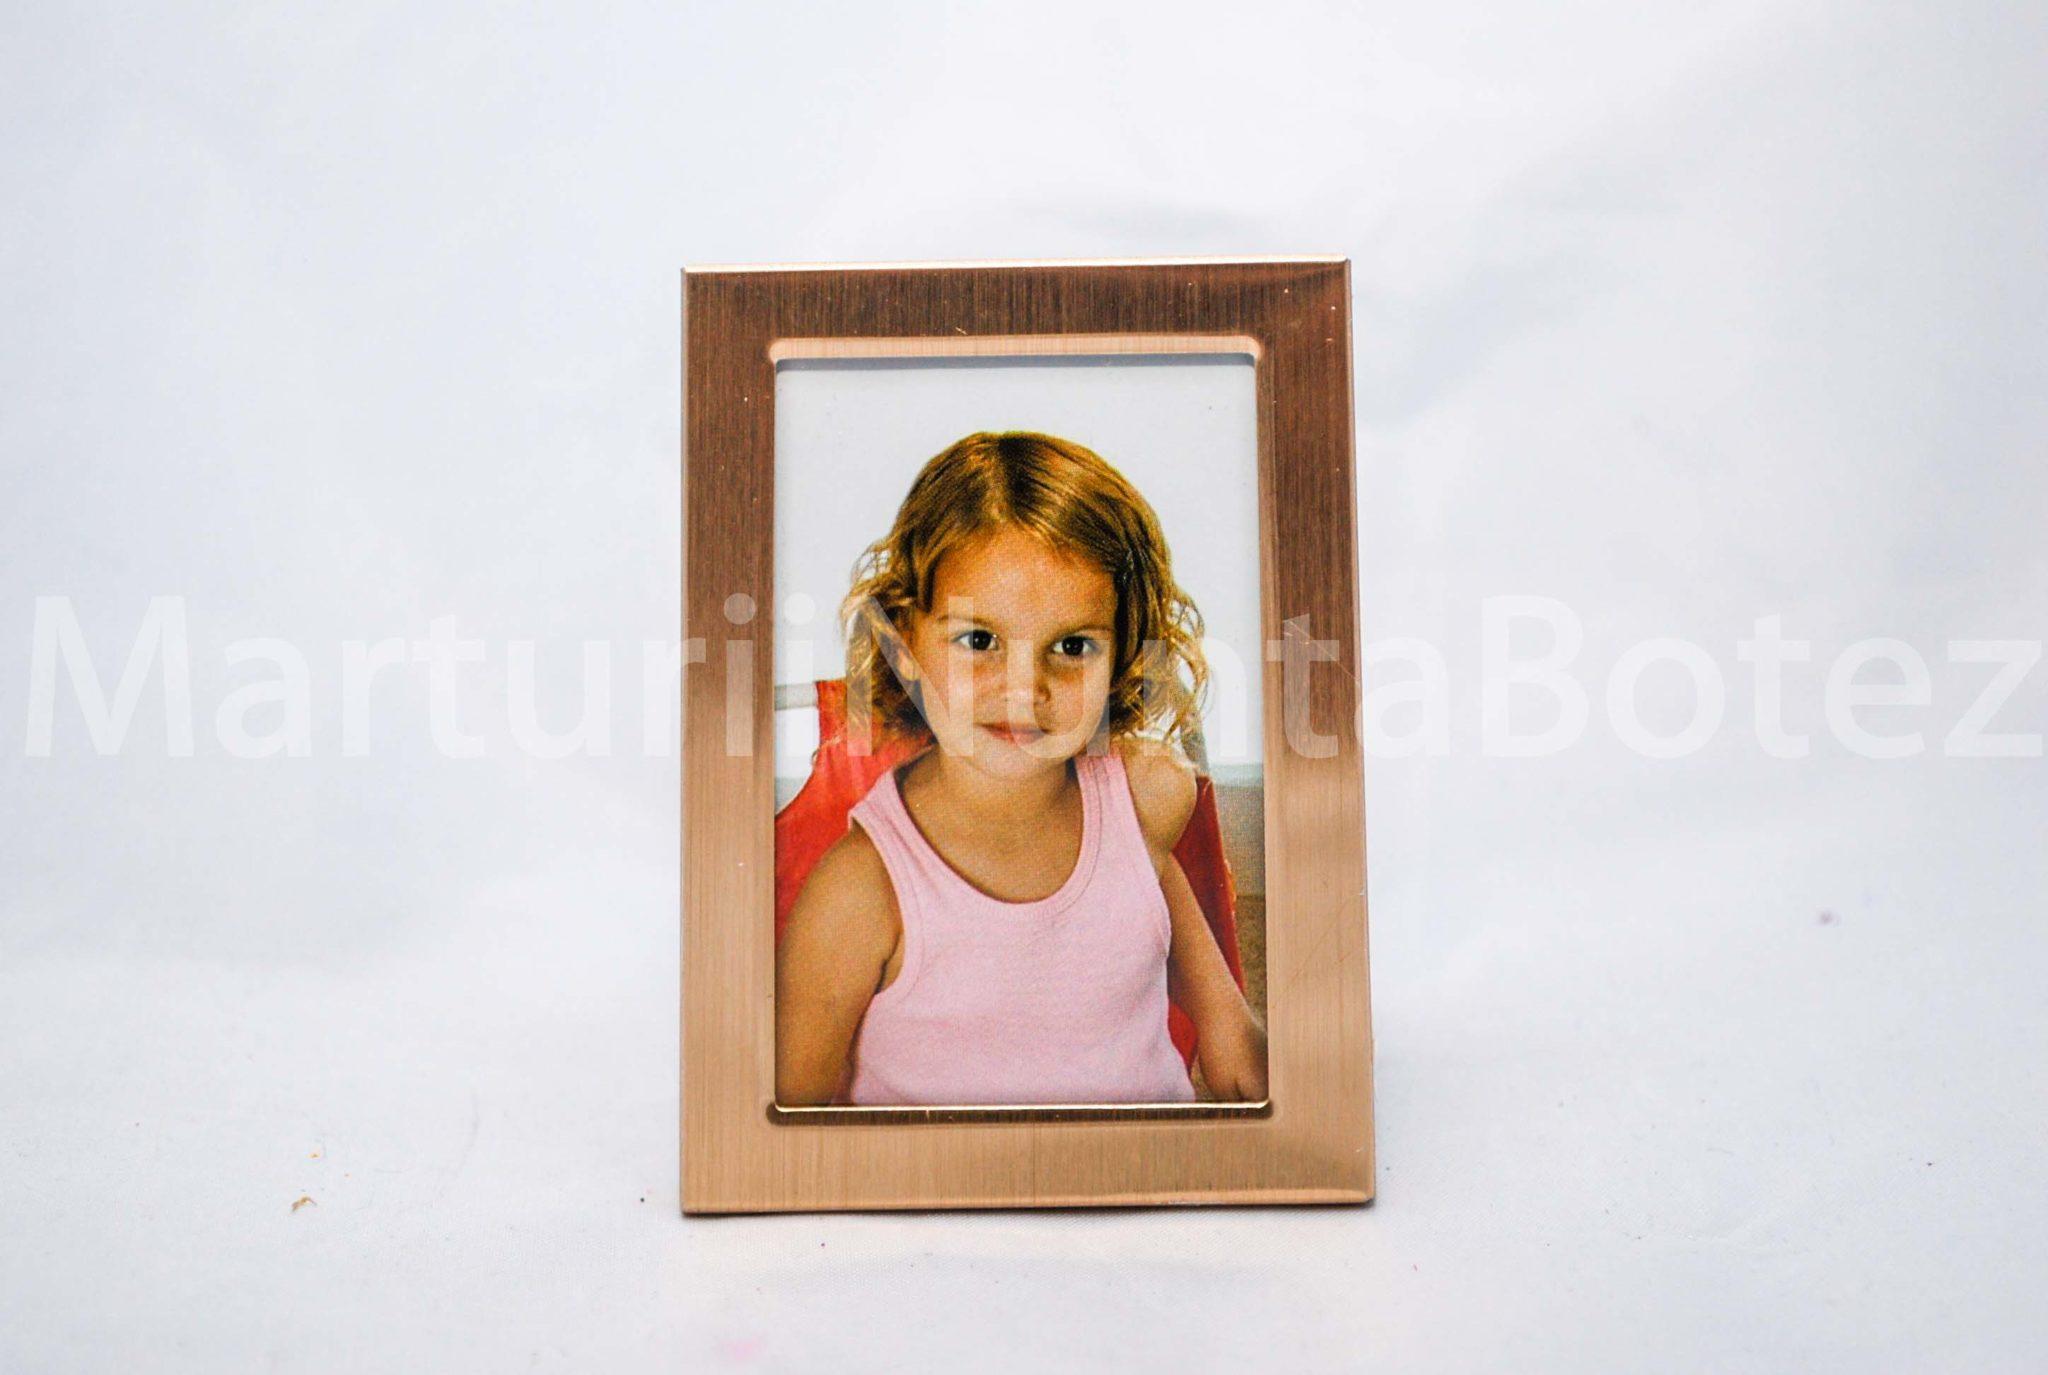 marturii_nunta_marturie_botez_rama_foto_calitate_superioara_patrat8